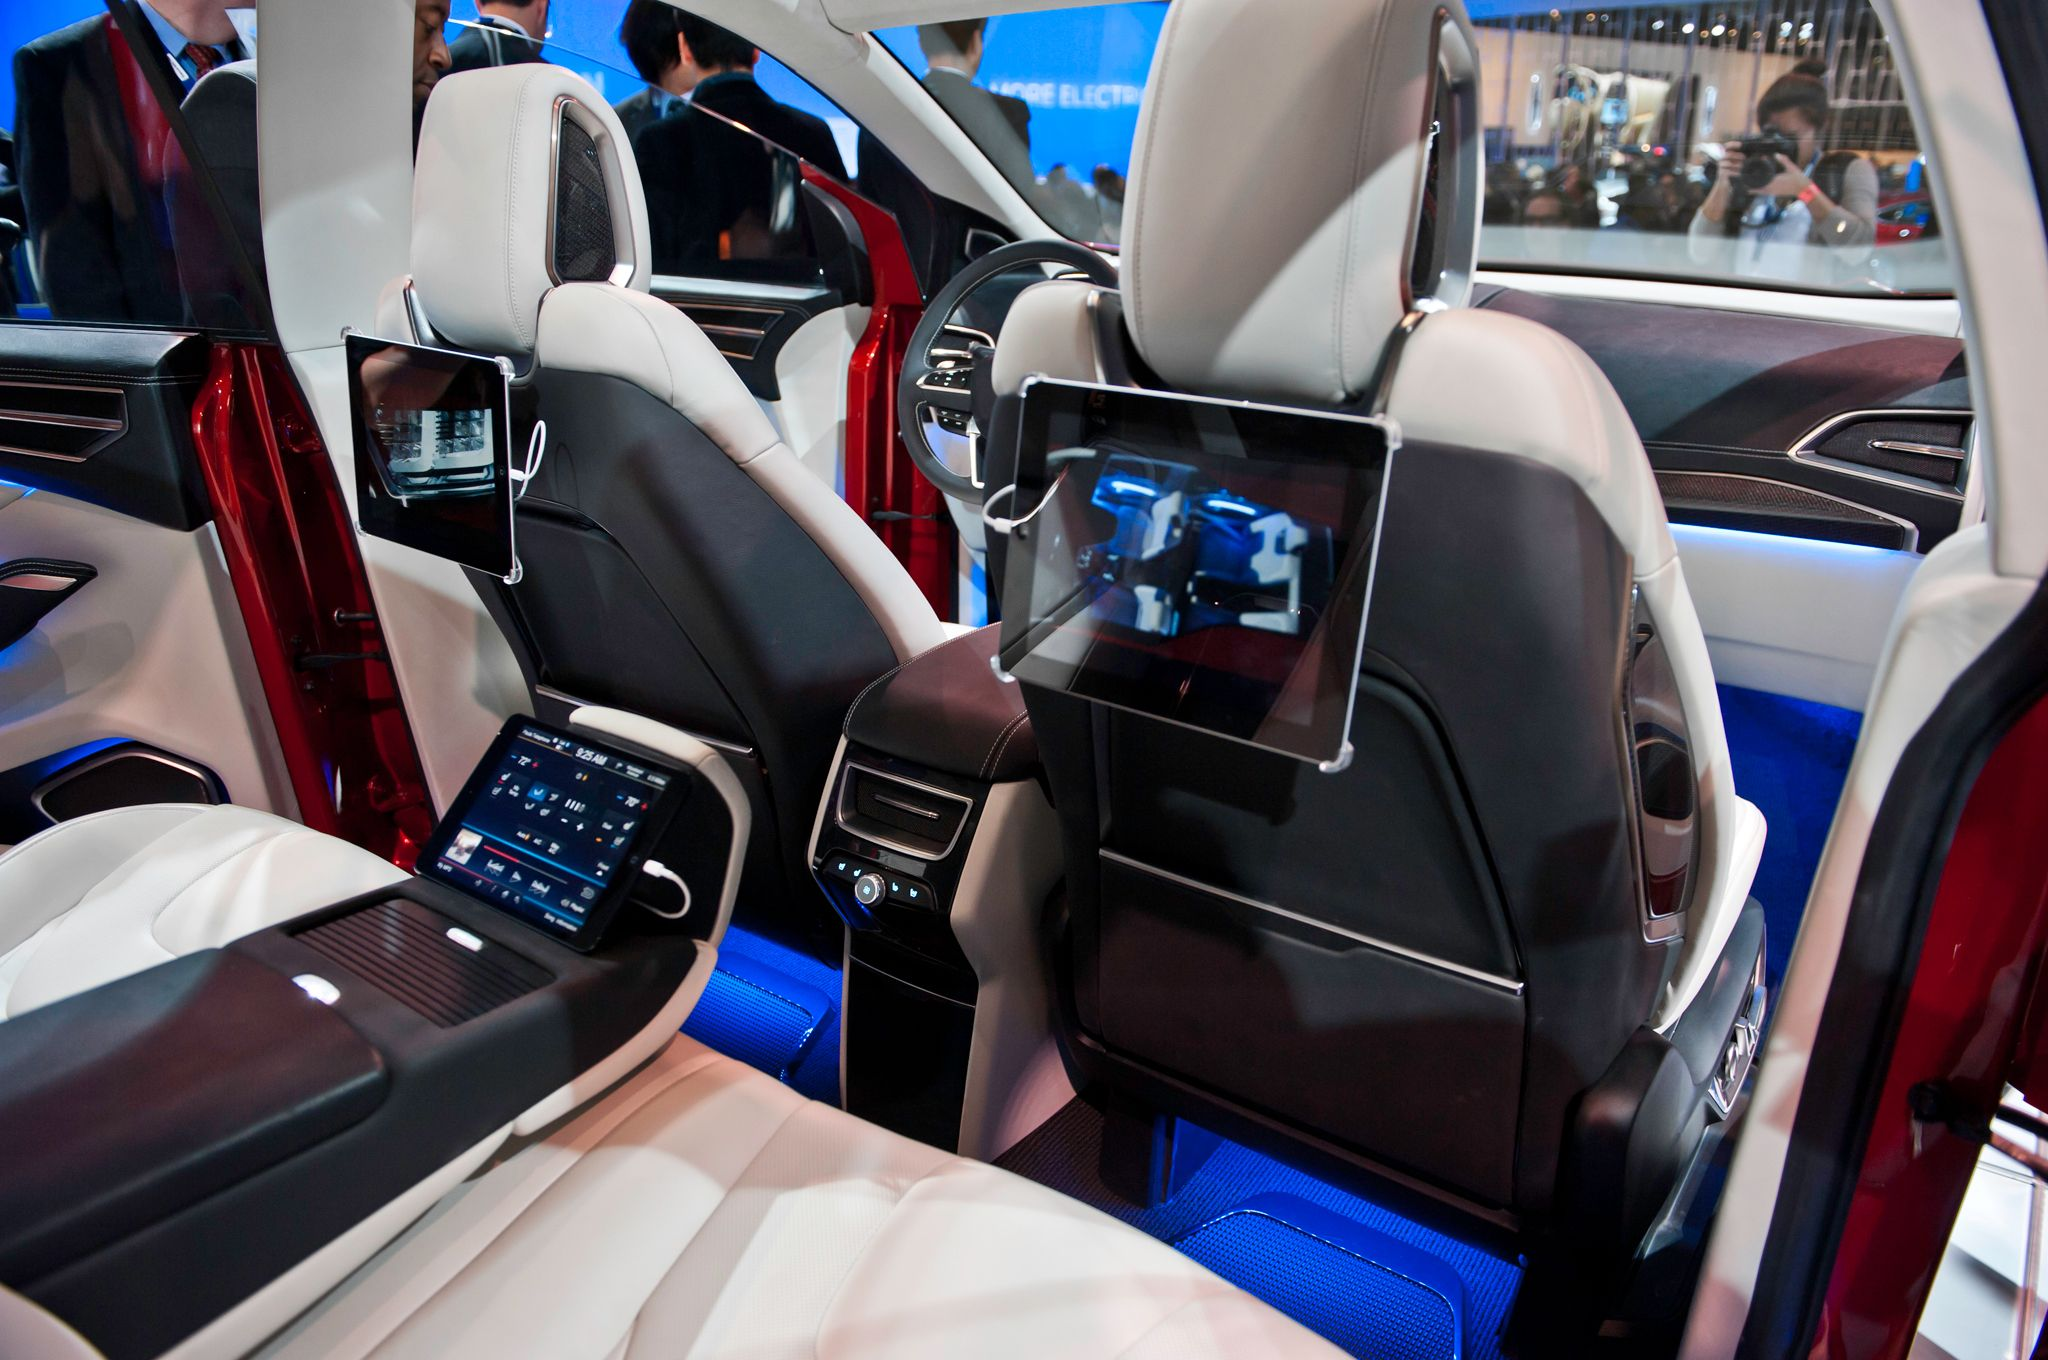 Car interior entertainment - Ford Edge Concept Interior Rear Seats Jpg 2048